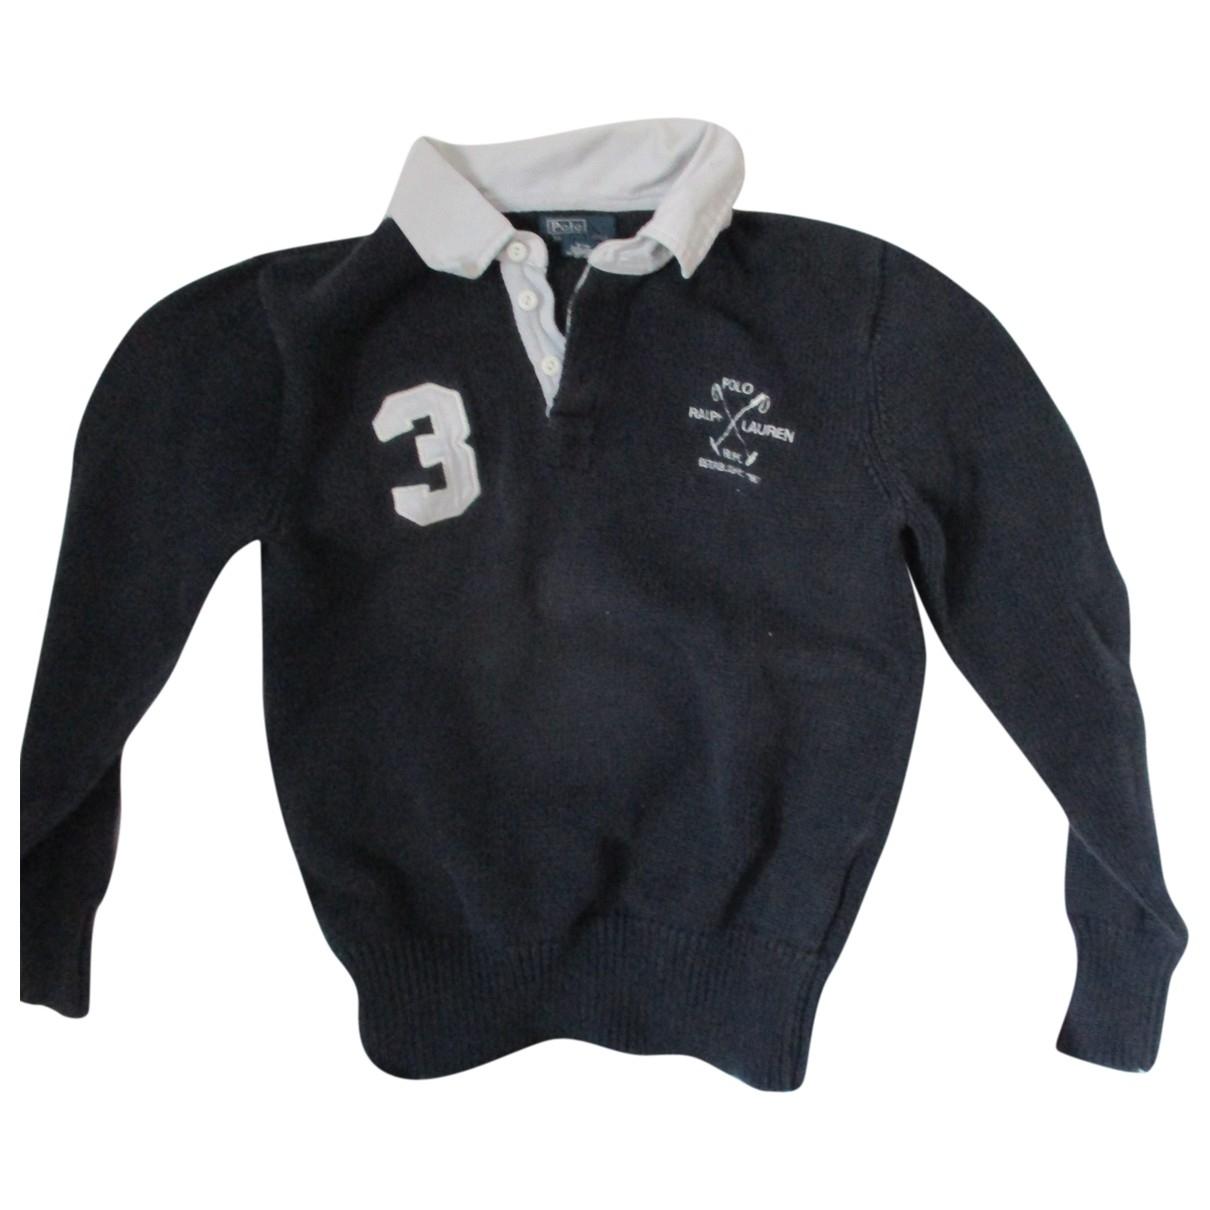 Polo Ralph Lauren \N Blue Cotton Knitwear for Kids 12 years - XS UK